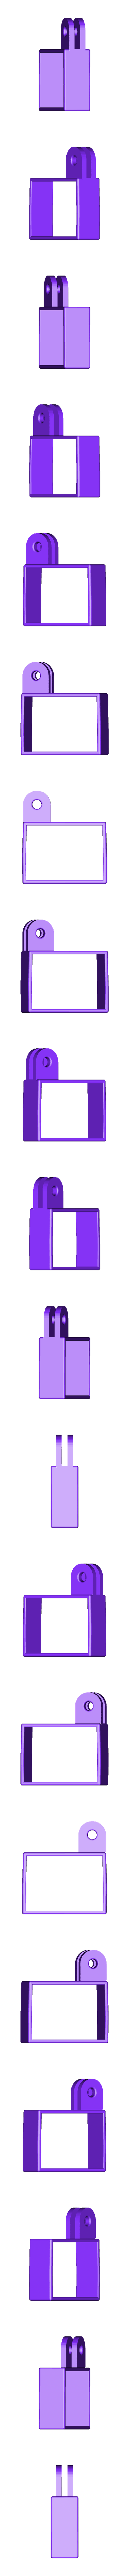 support_final.stl Download free STL file GoPro hero support • 3D printable object, charlelie81